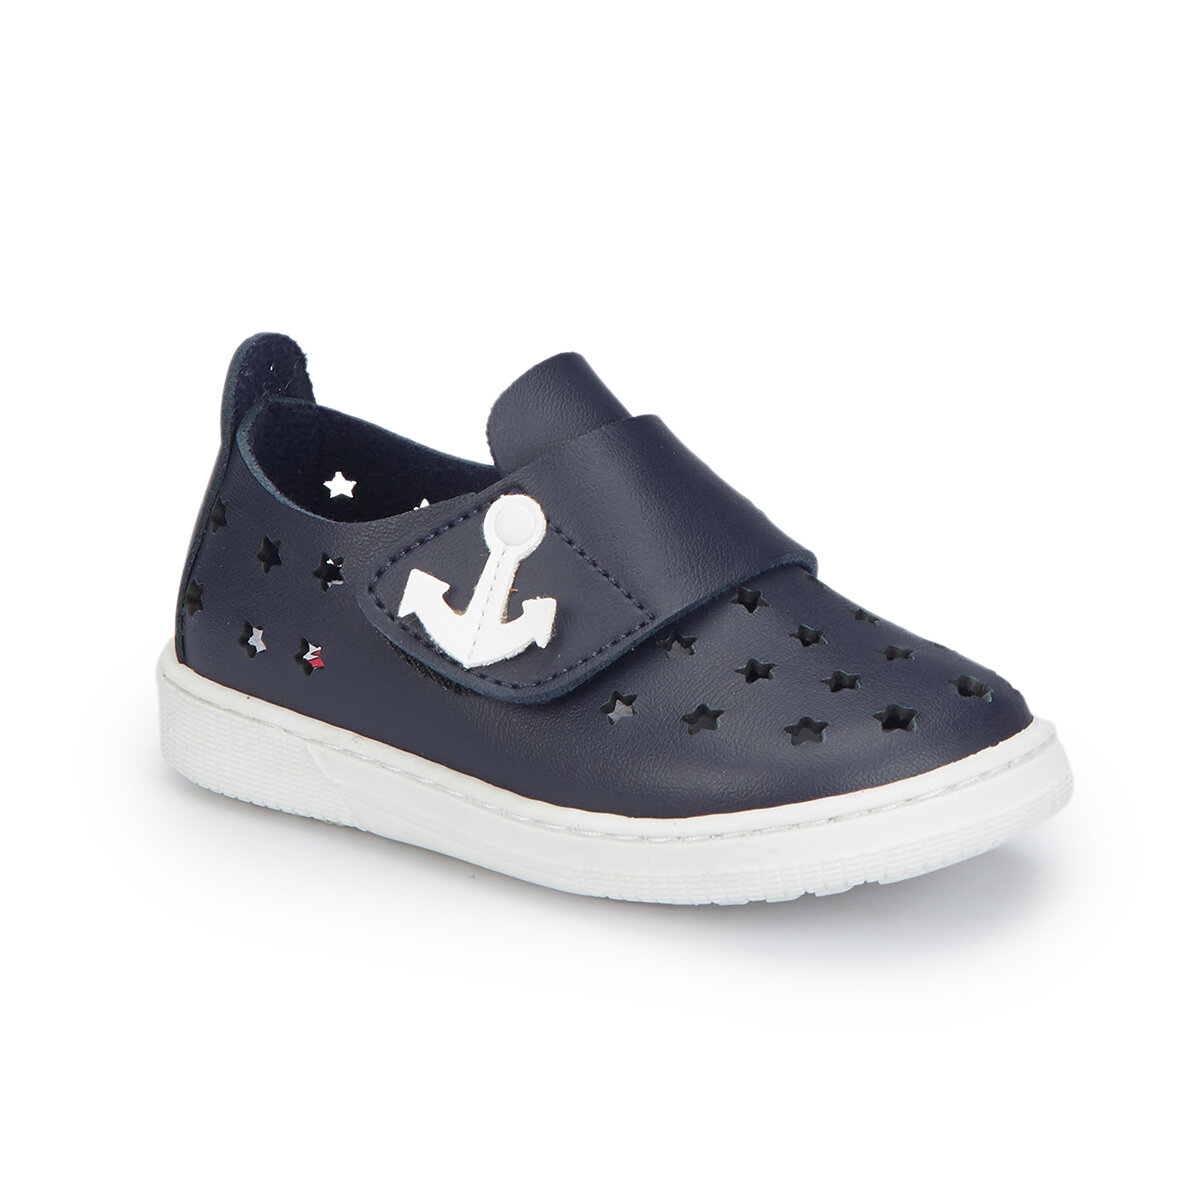 FLO 81.510270.B Navy Blue Male Child Sneaker Shoes Polaris